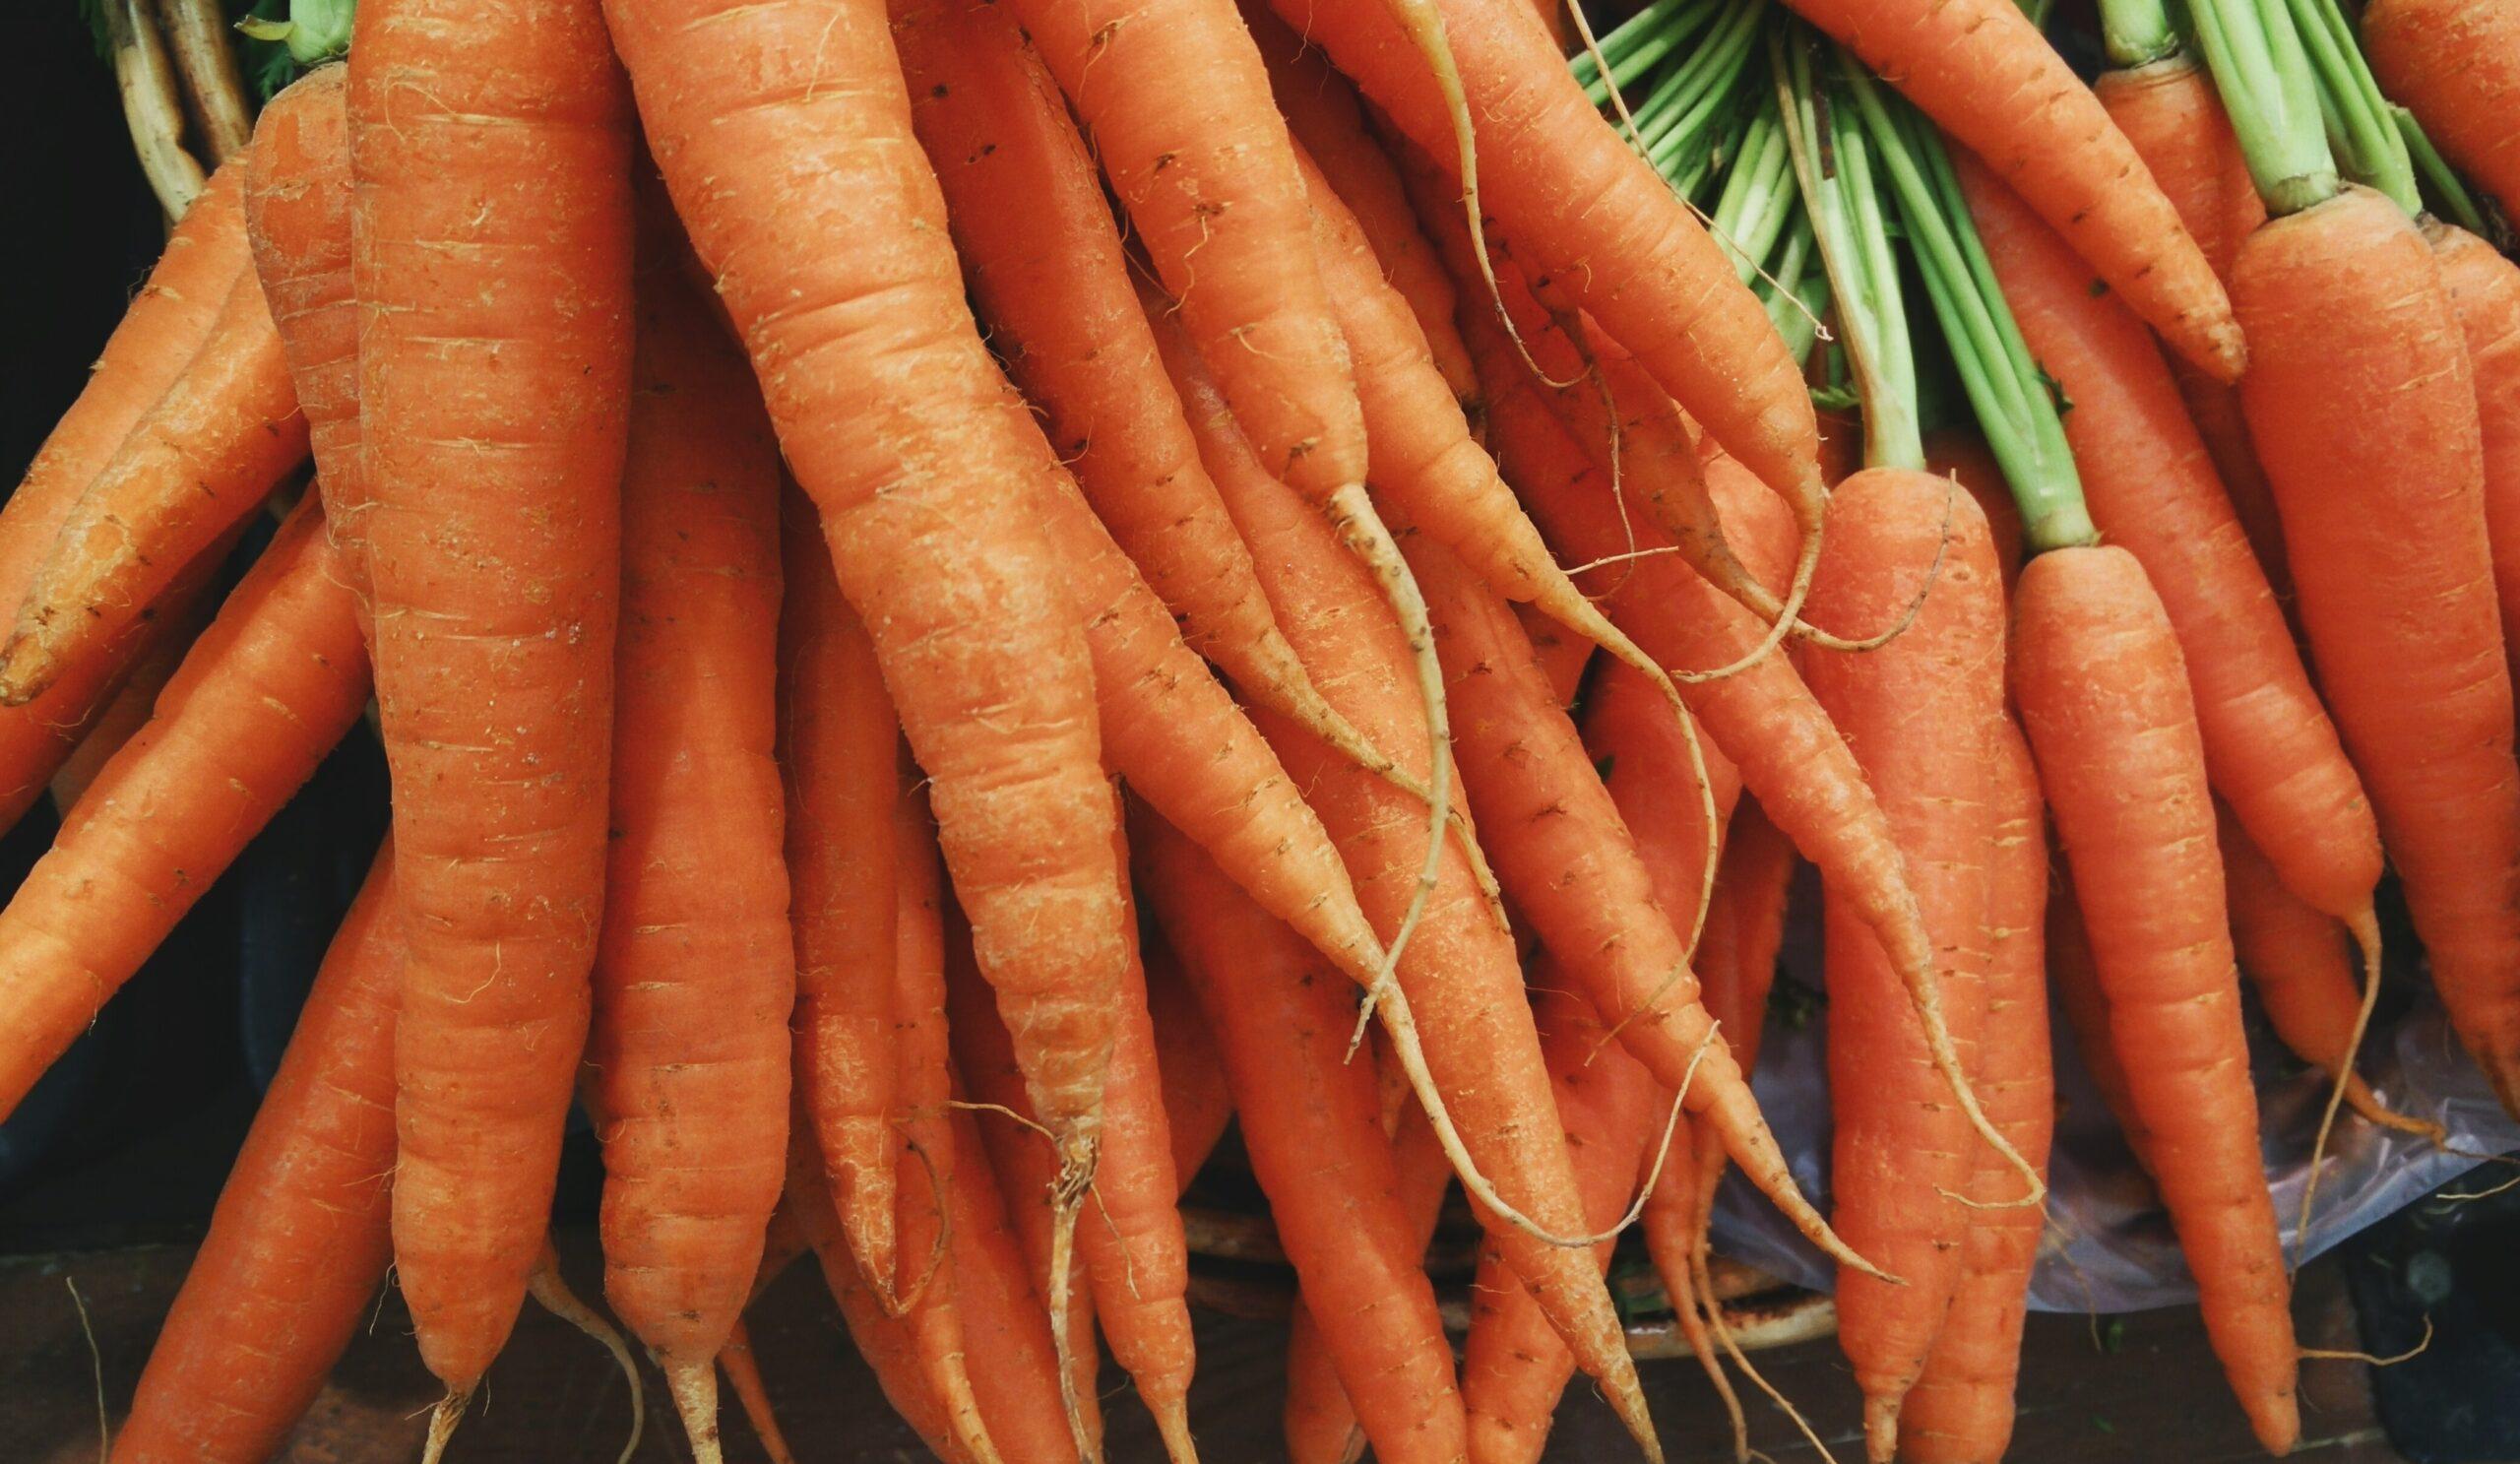 Carrots for Santa's reindeer